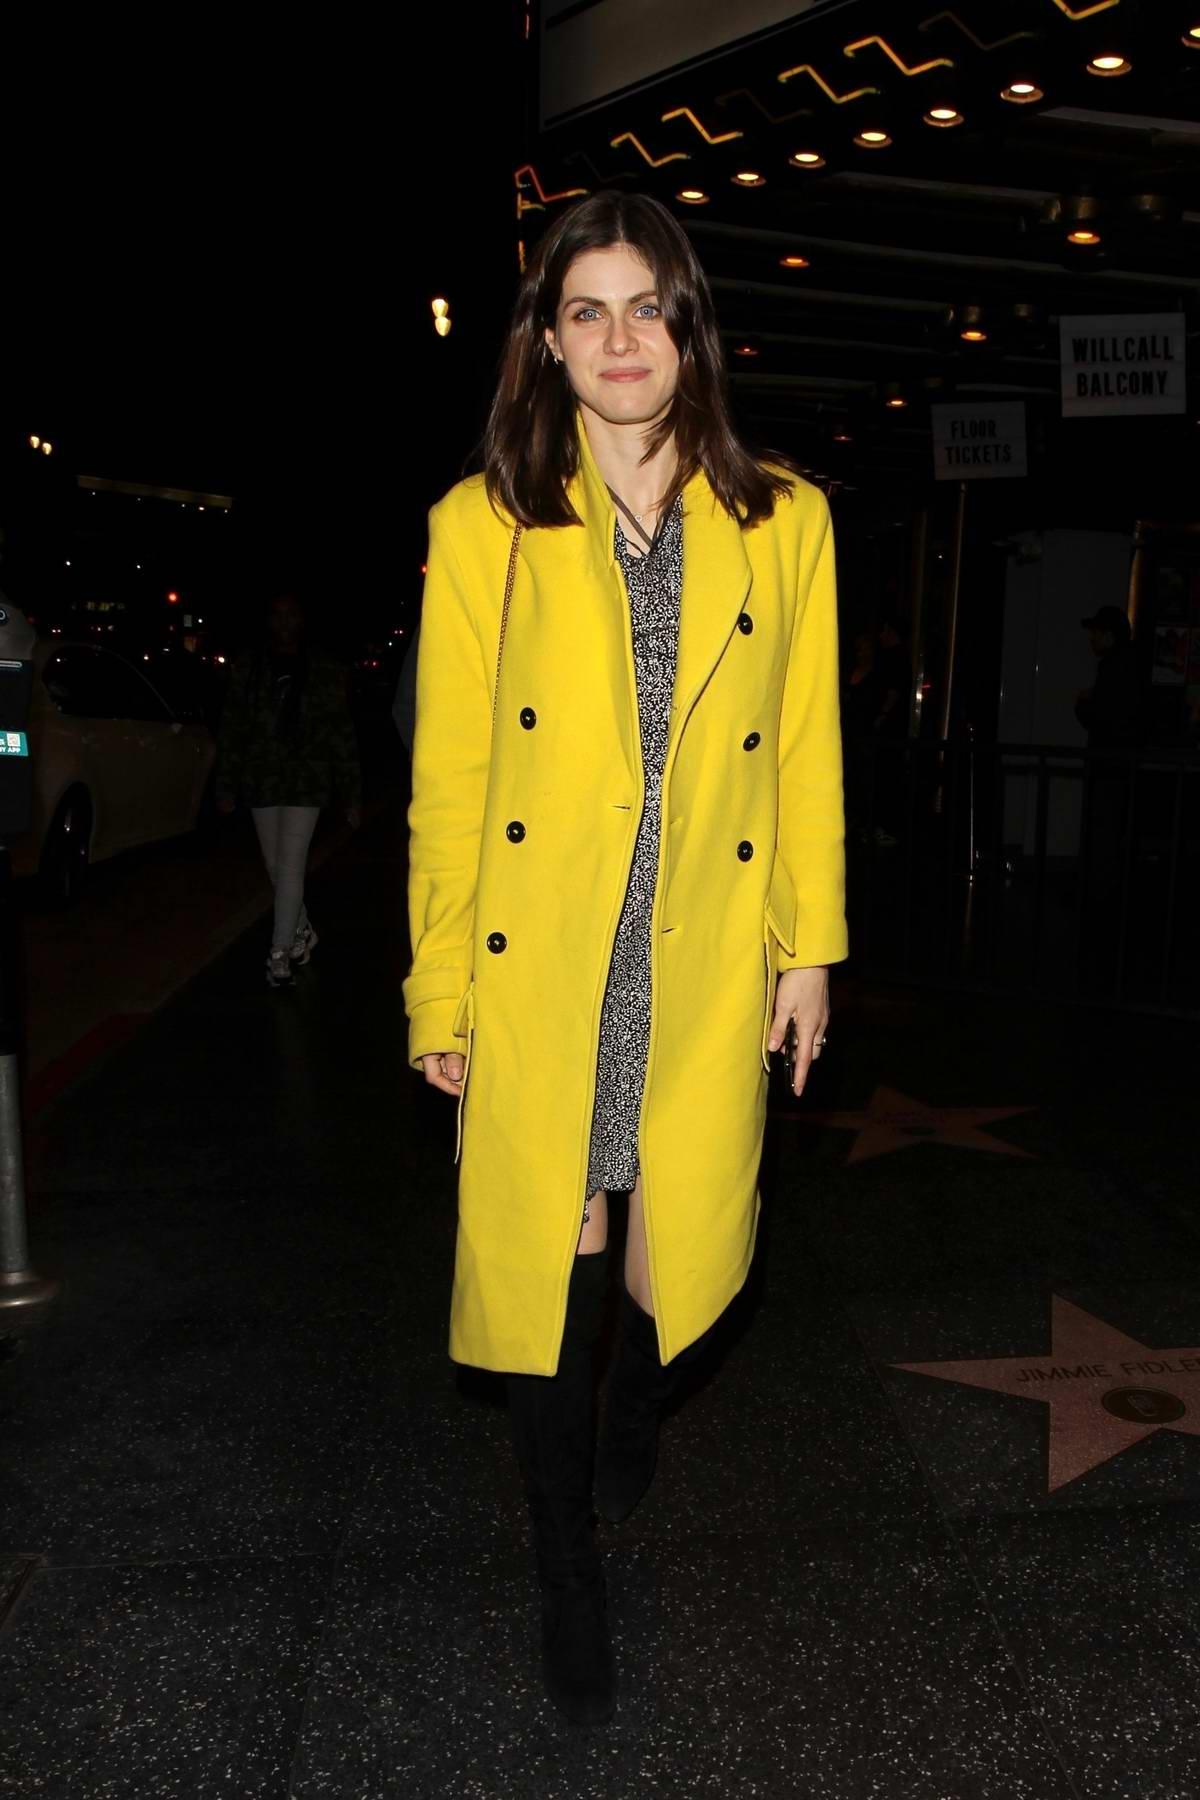 Alexandra Daddario seen leaving The Fonda Theatre after attending the Albert Hammond Jr. concert in Hollywood, California